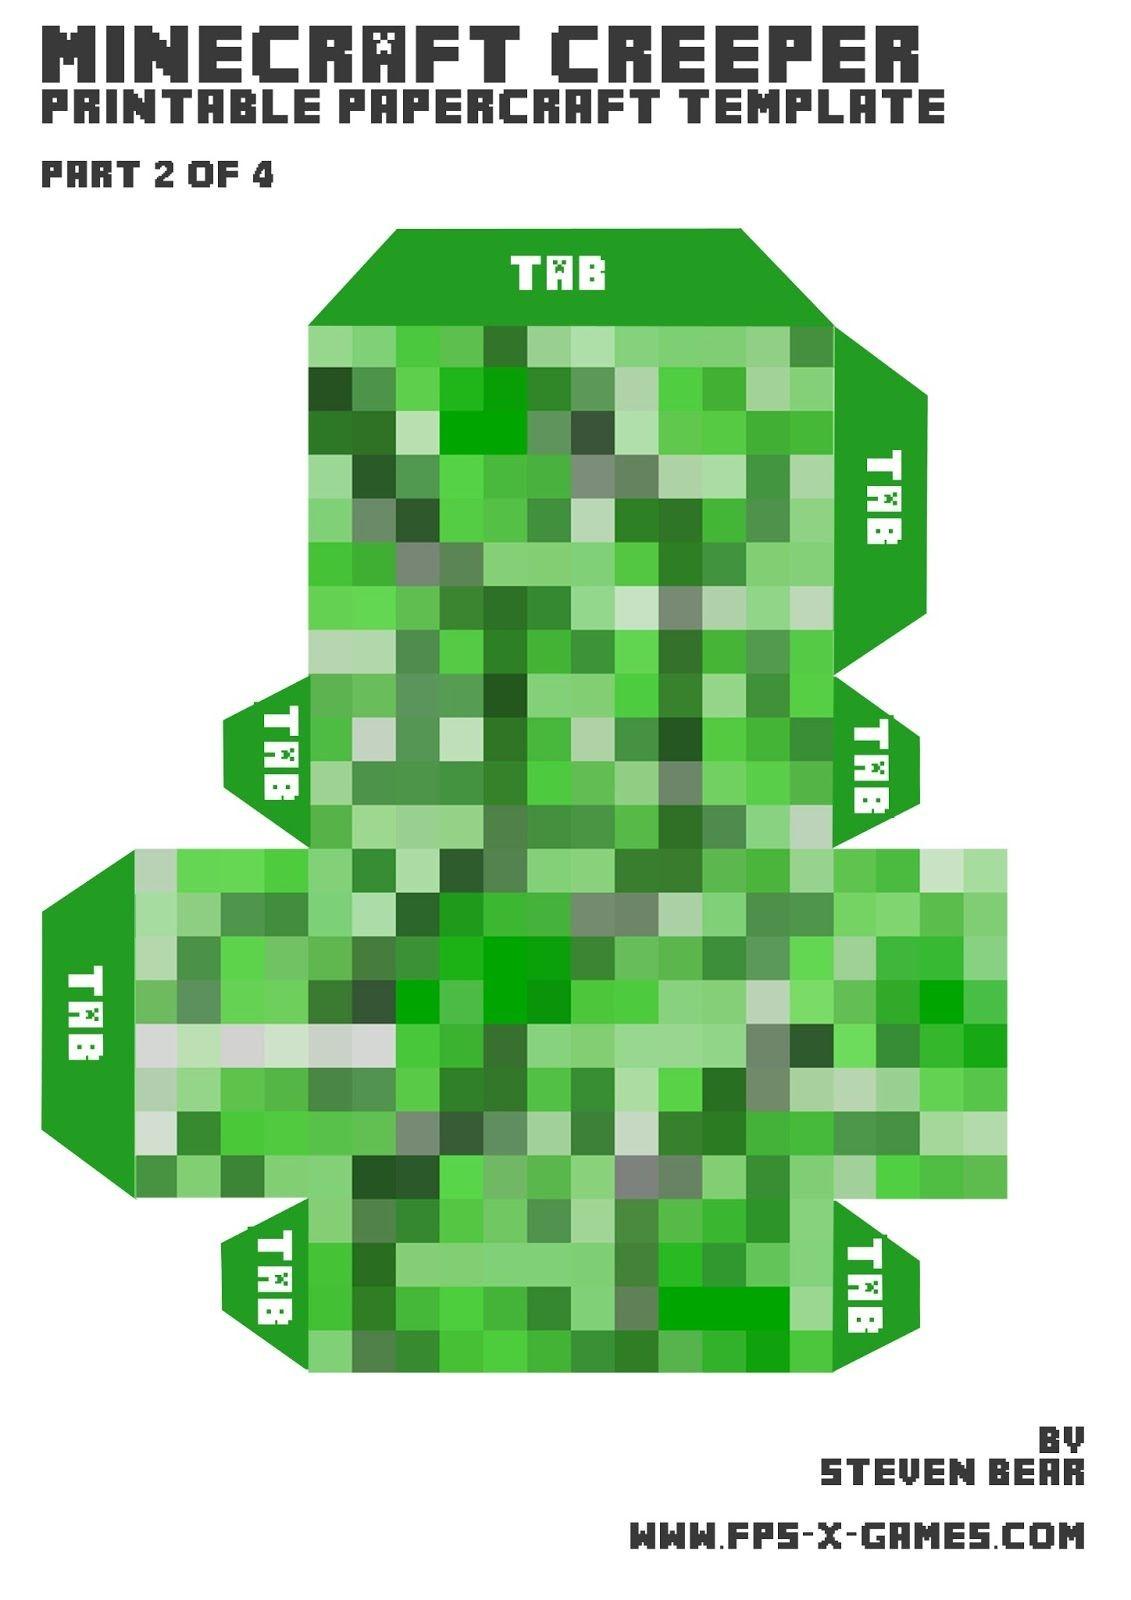 Minecraft Papercraft Studio Minecraft Printables Creeper Minecraft Creeper Free